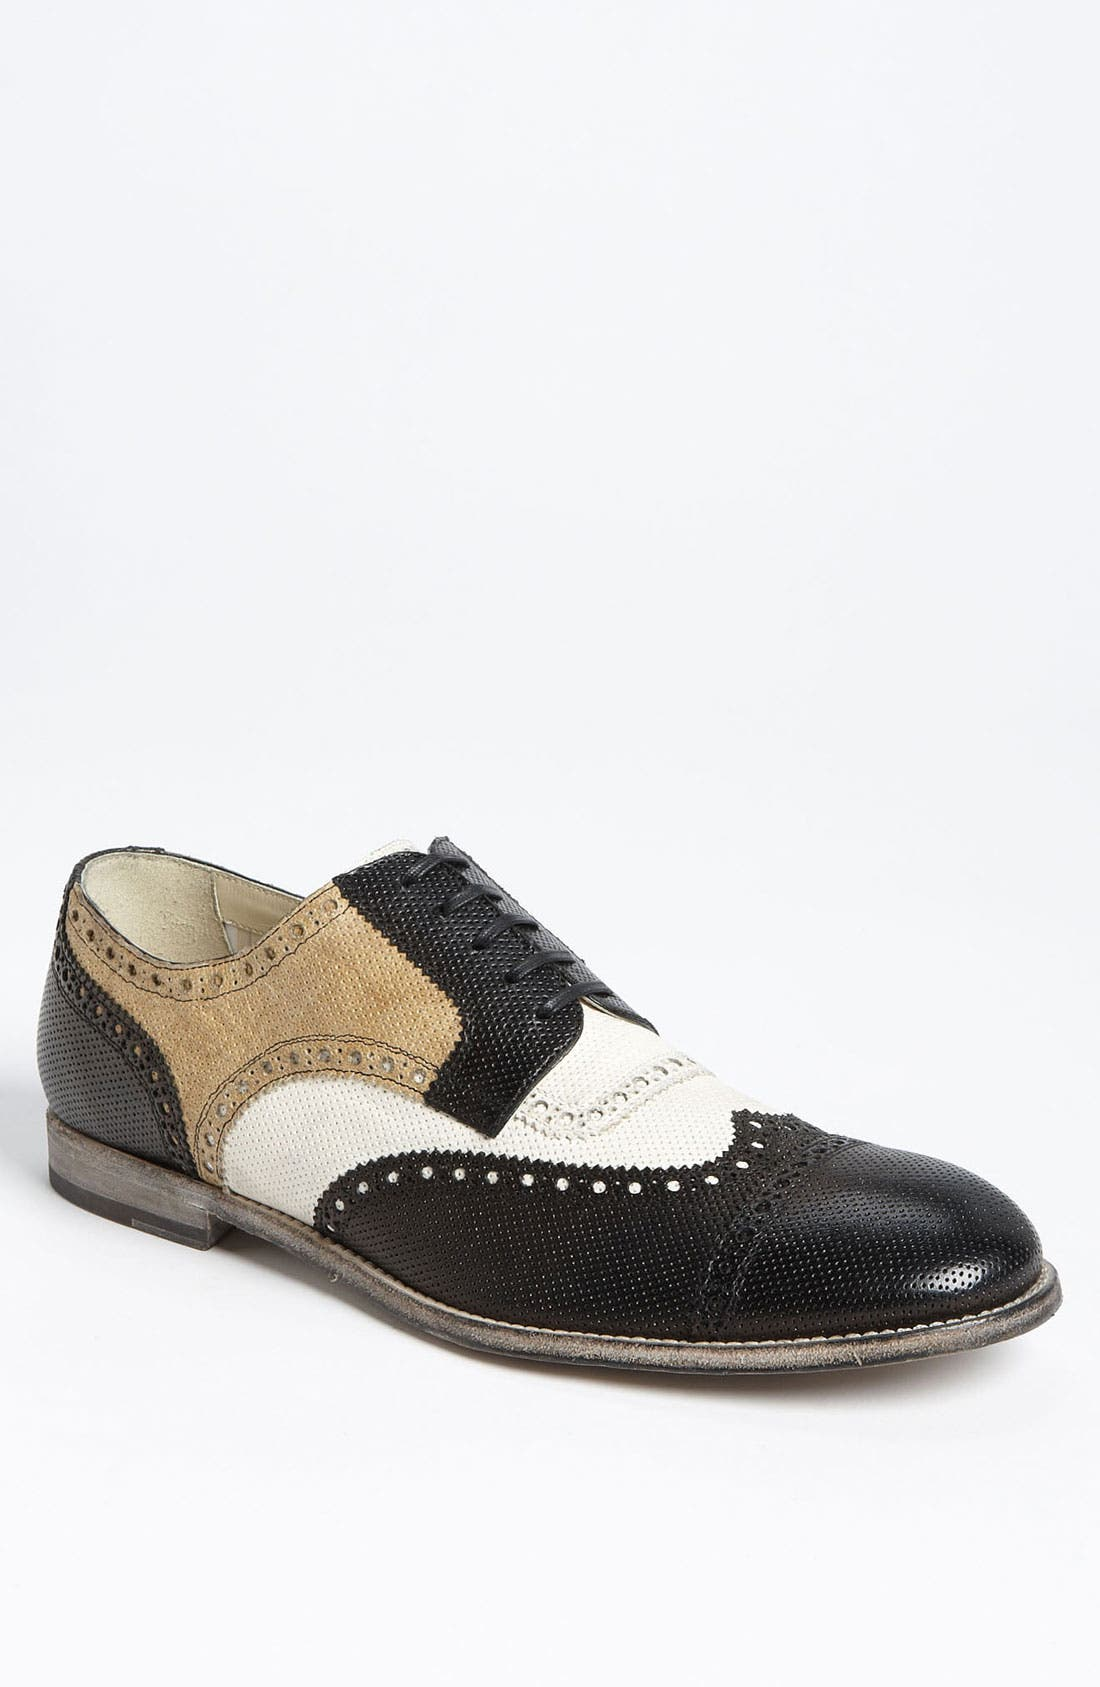 Main Image - Dolce&Gabbana Perforated Spectator Shoe